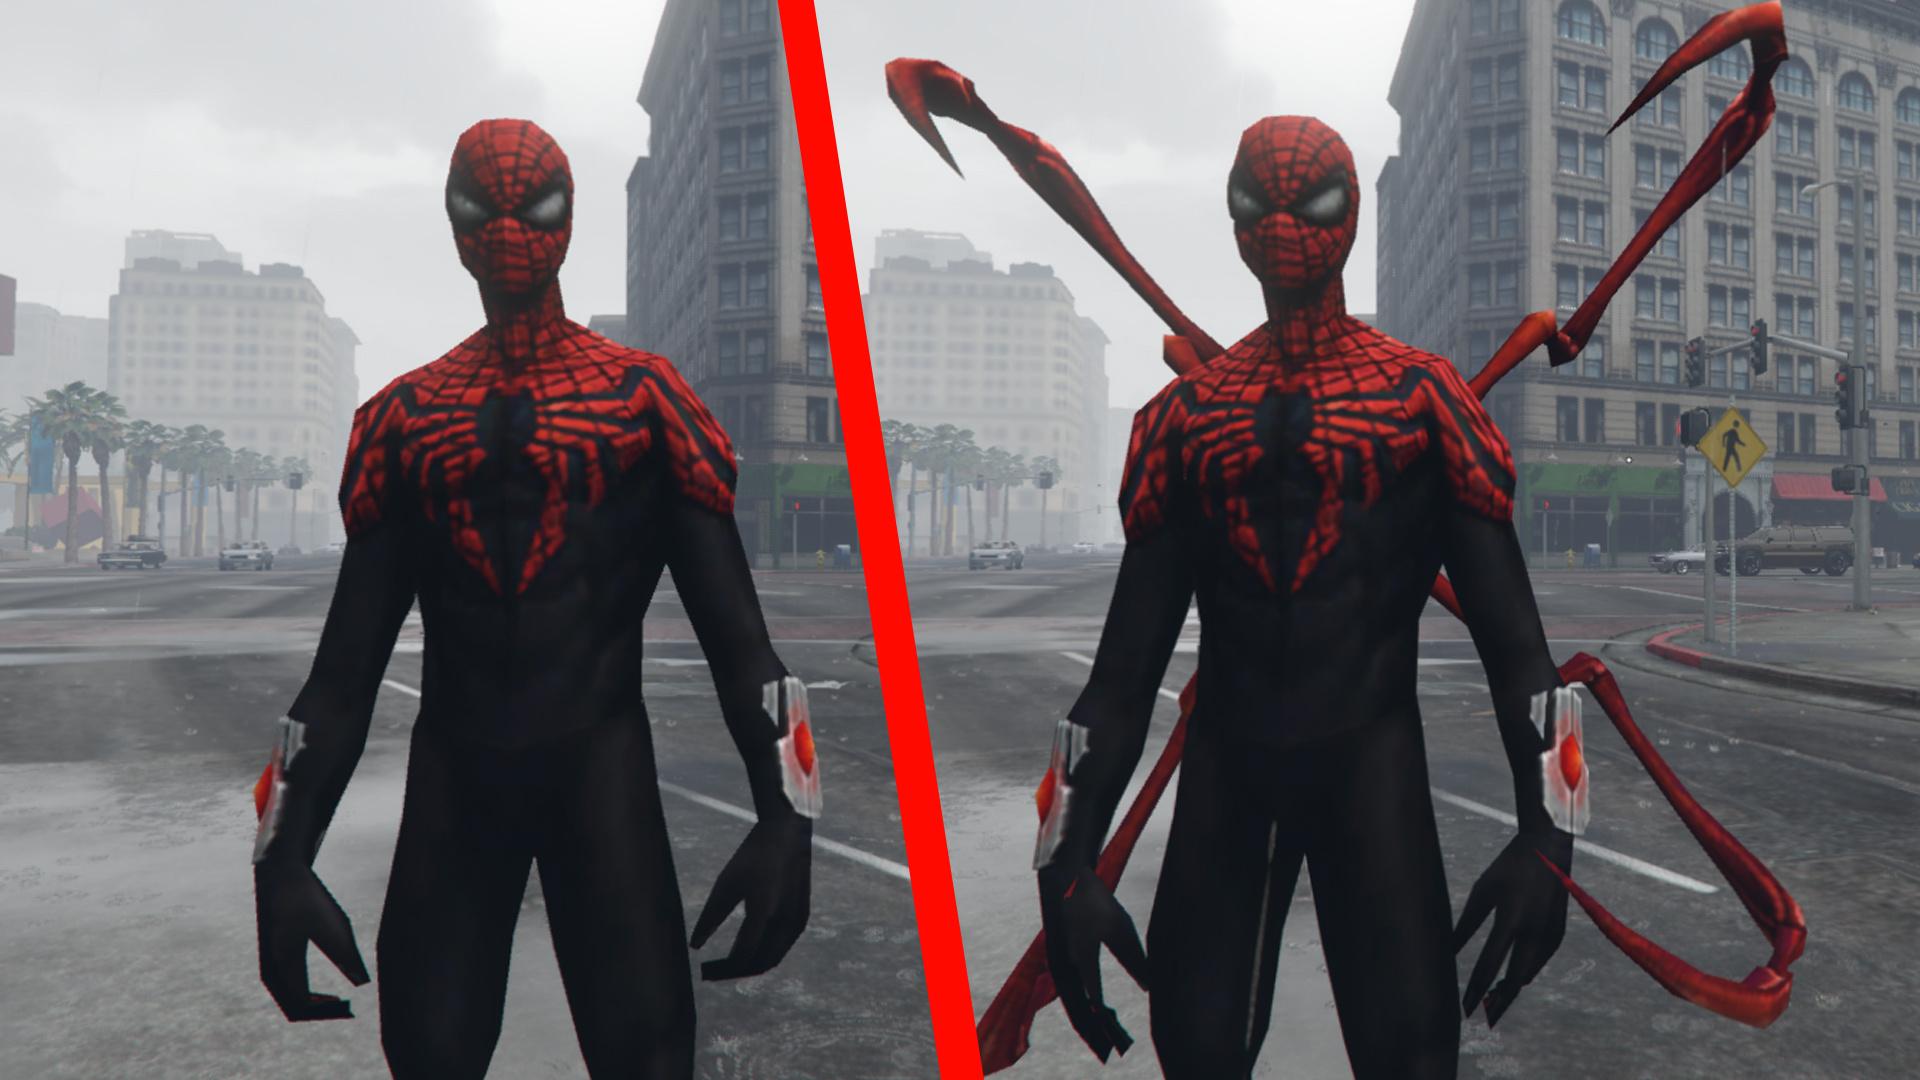 Excited too superior spider man